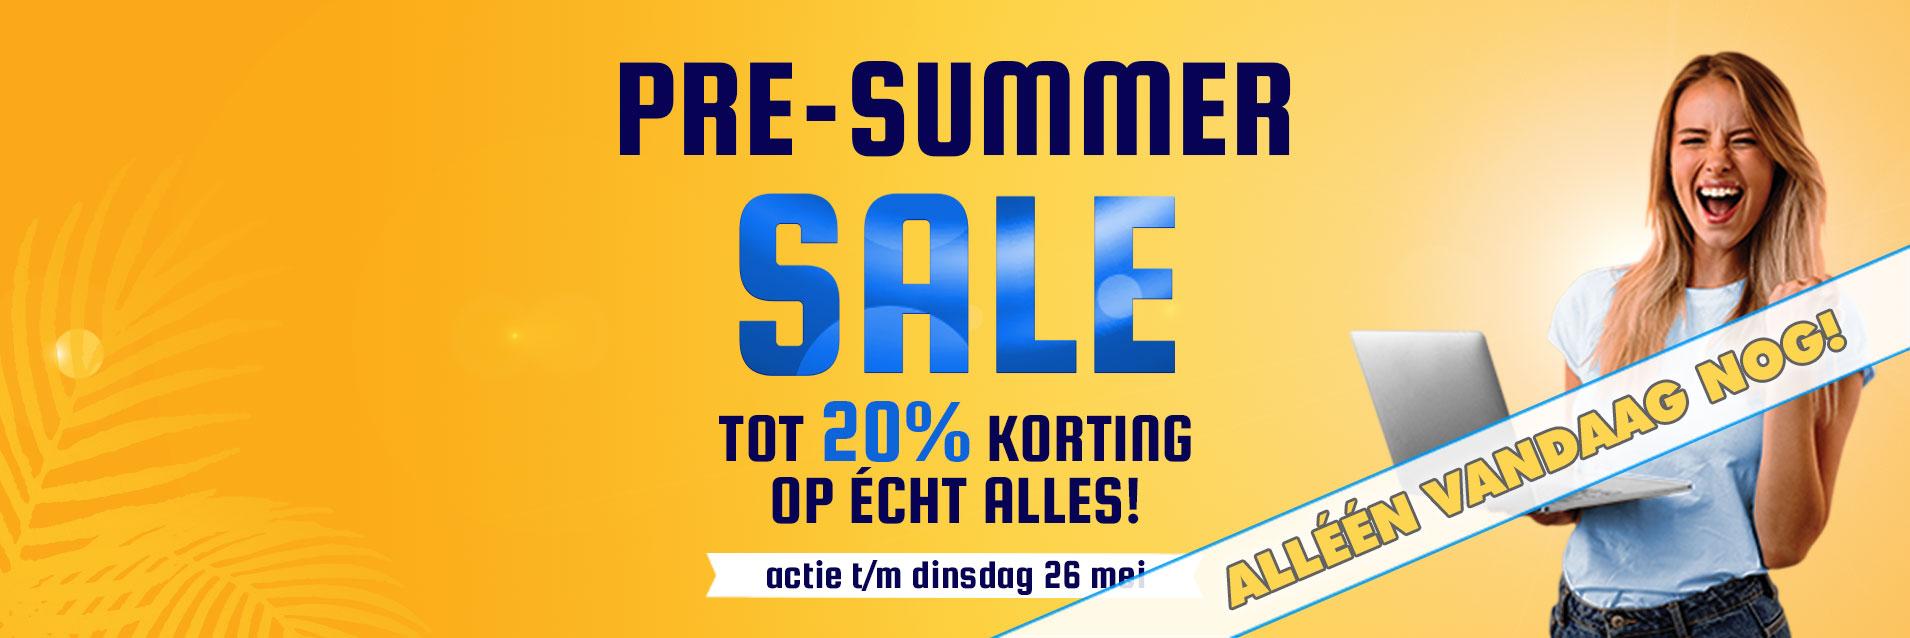 pre-summer sale tot 20% korting op écht alles